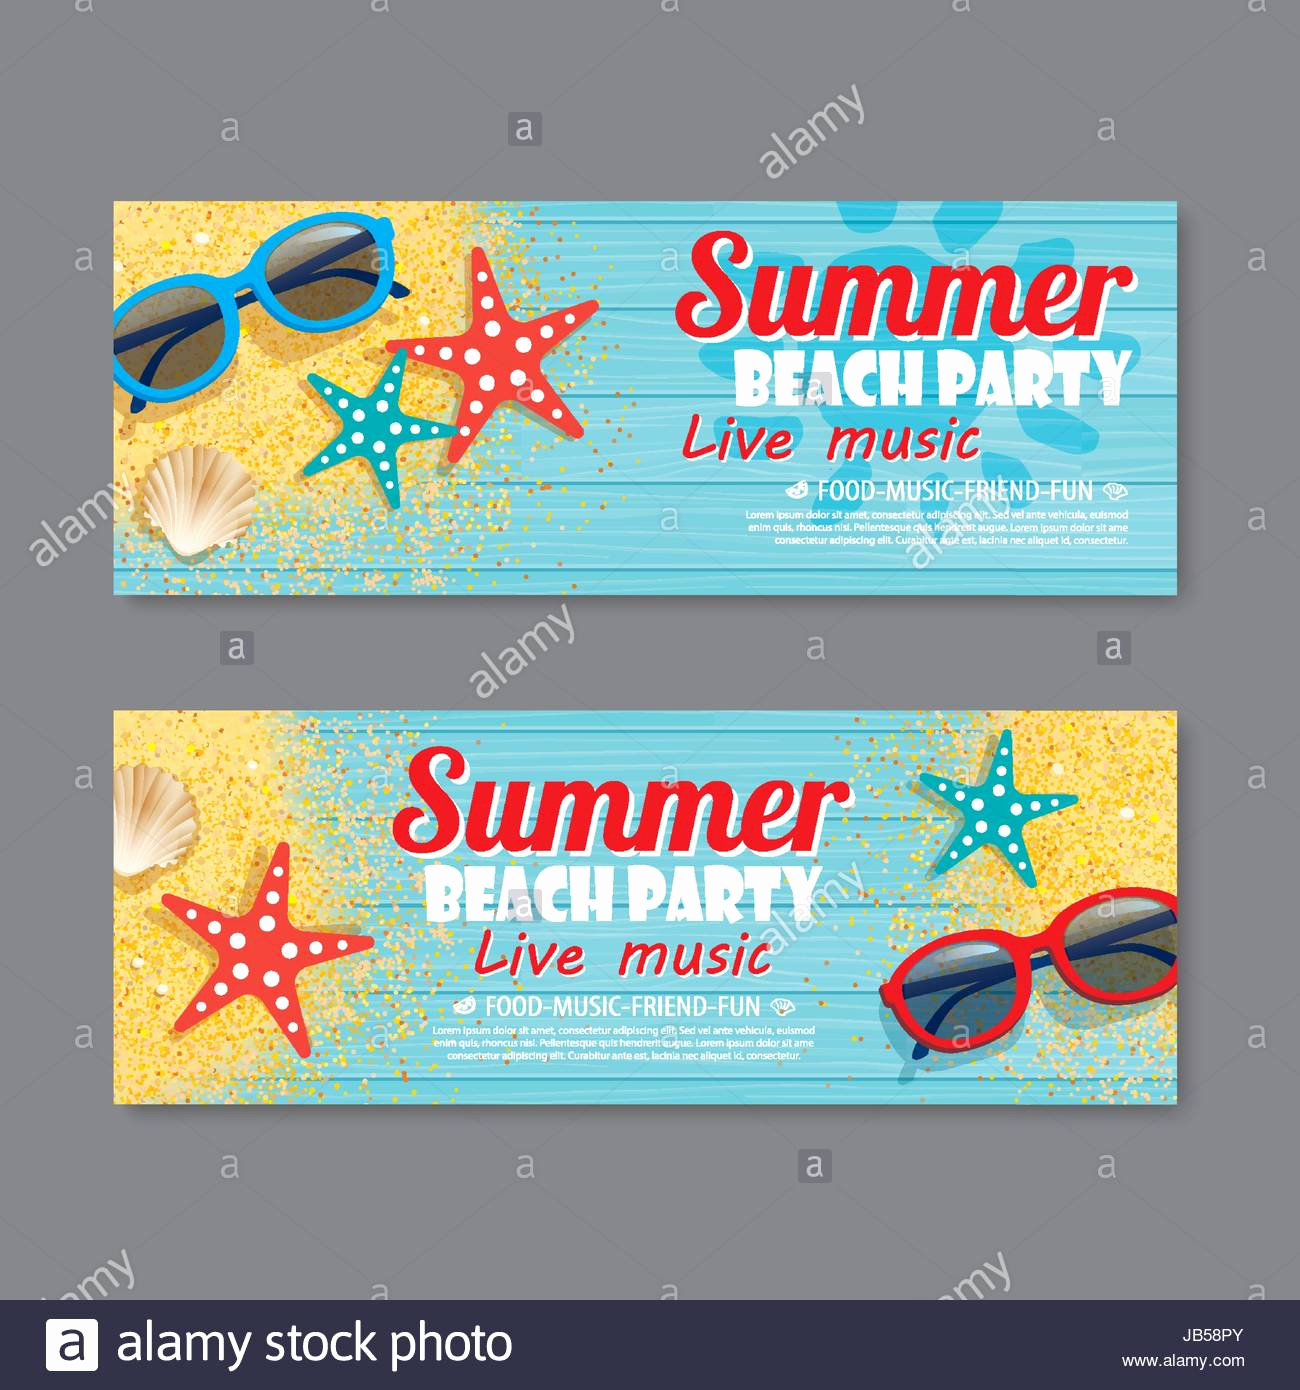 Beach Party Invitation Template Elegant Summer Beach Party Invitation Ticket Template Background